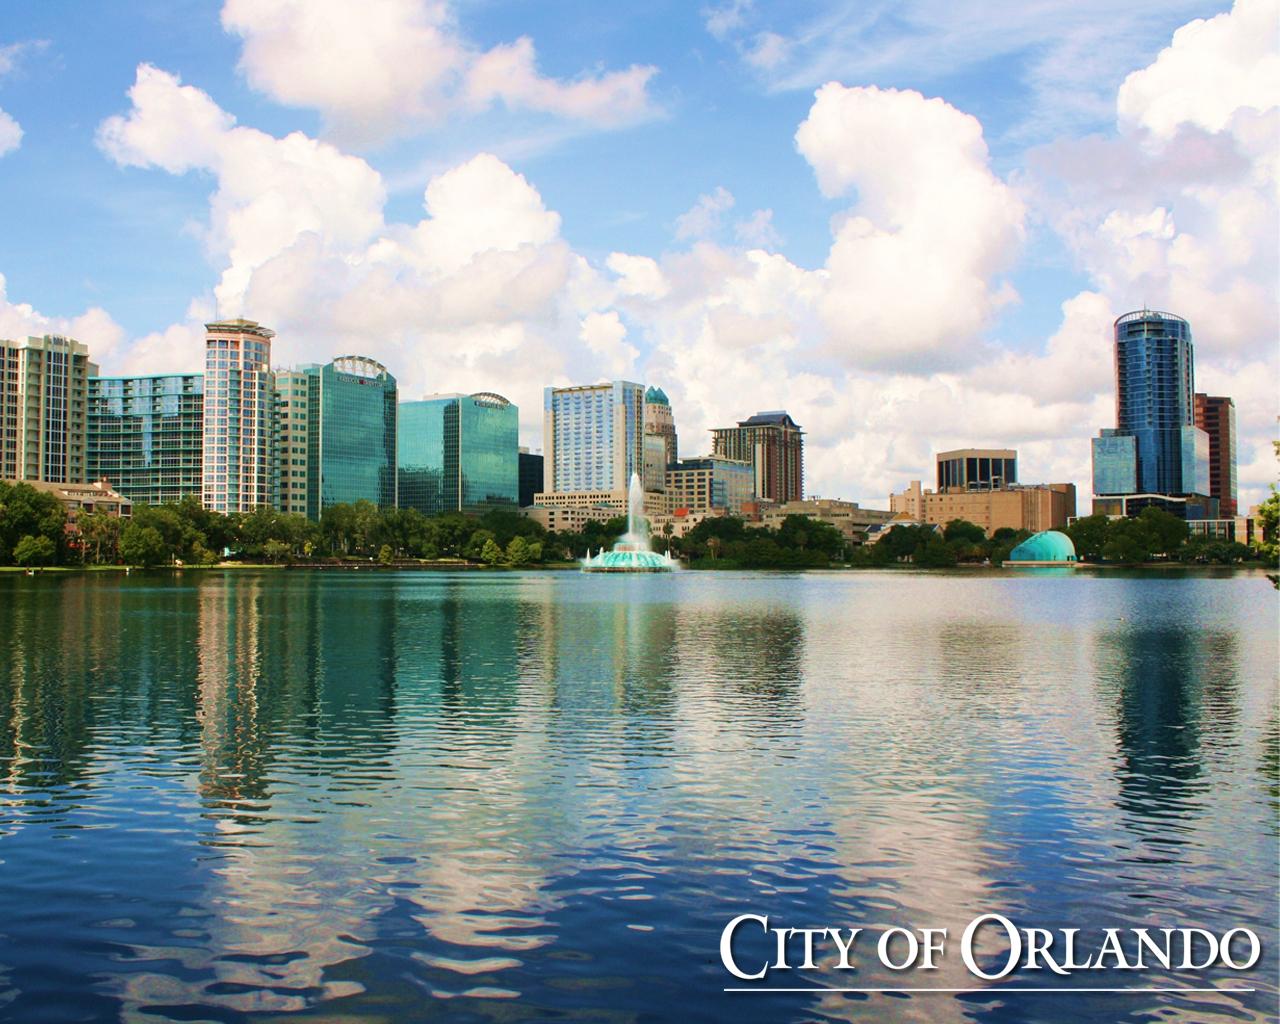 City of Orlando HD Wallpaper   HD Wallpapers, HD Backgrounds - Wallpaper Orlando - WallpaperSafari